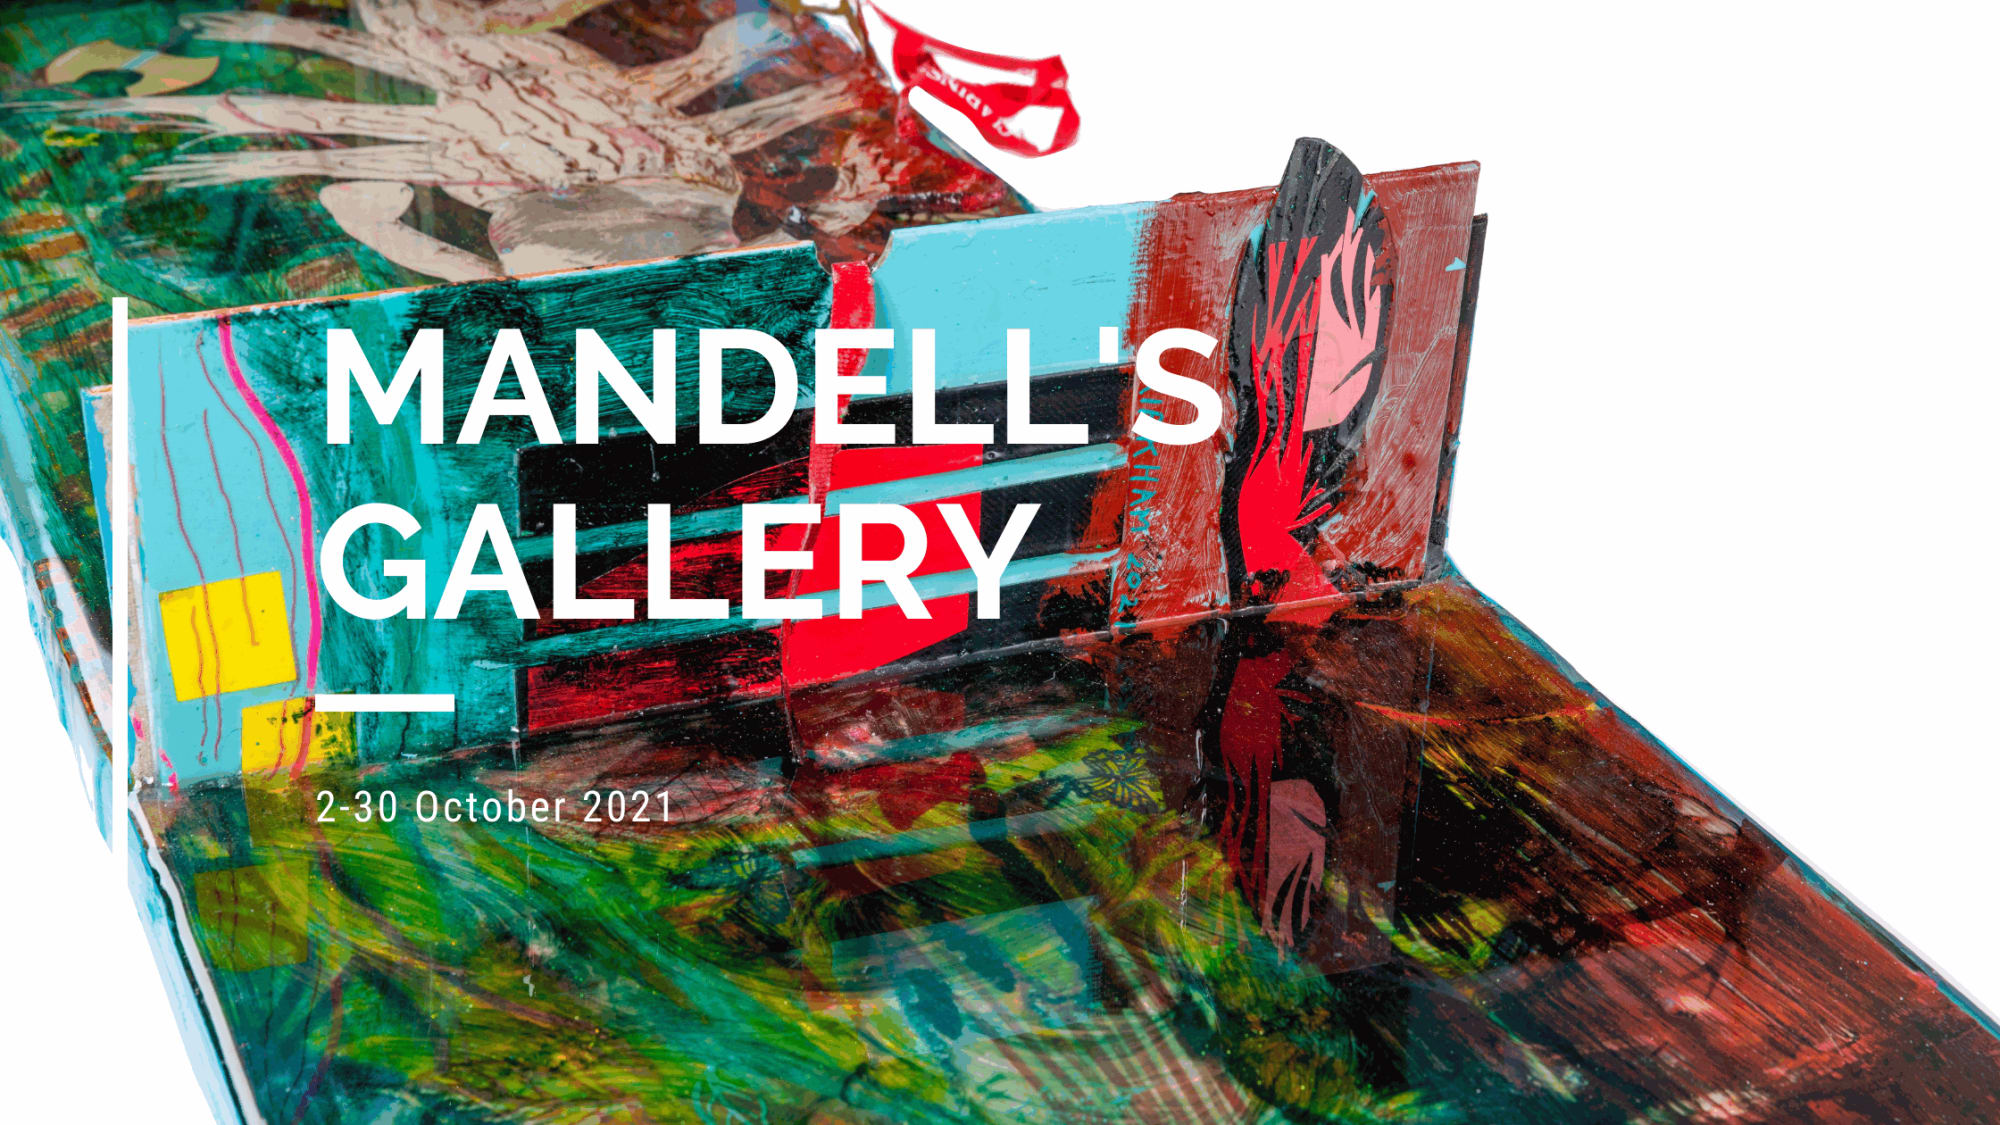 Mandell's Gallery